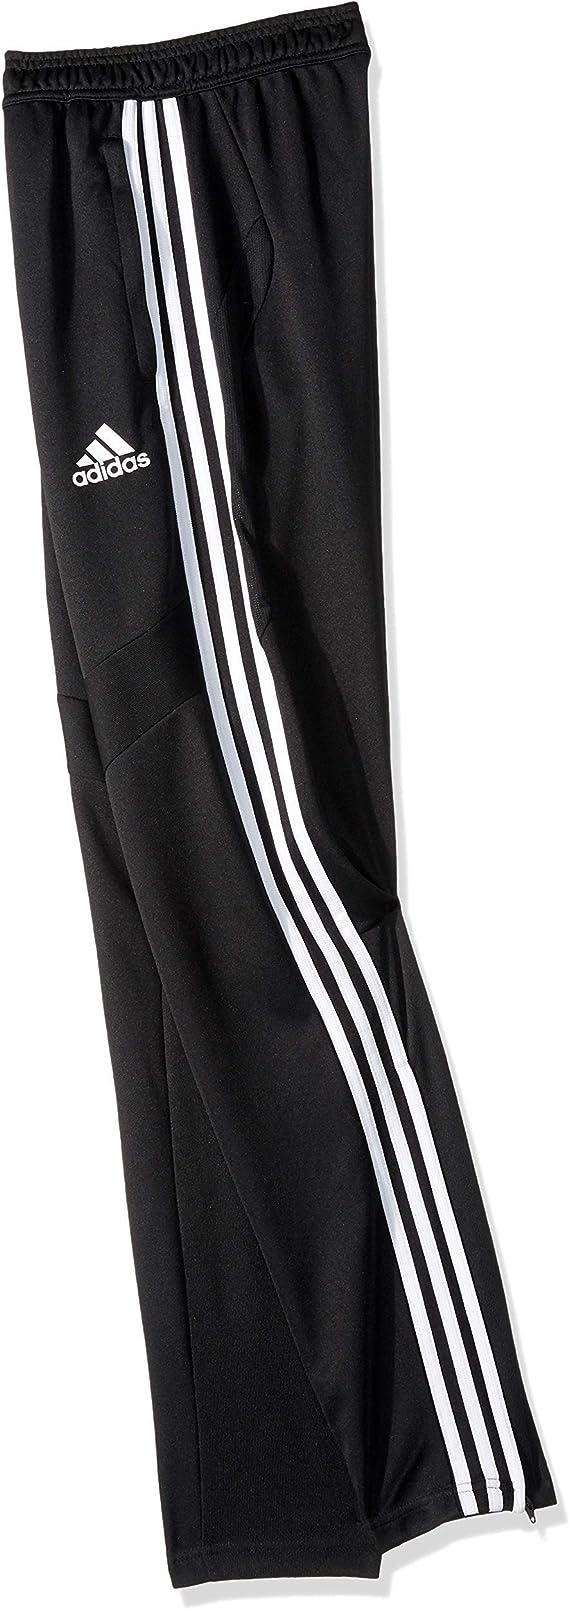 adidas Kids' Youth Tiro19 Pants